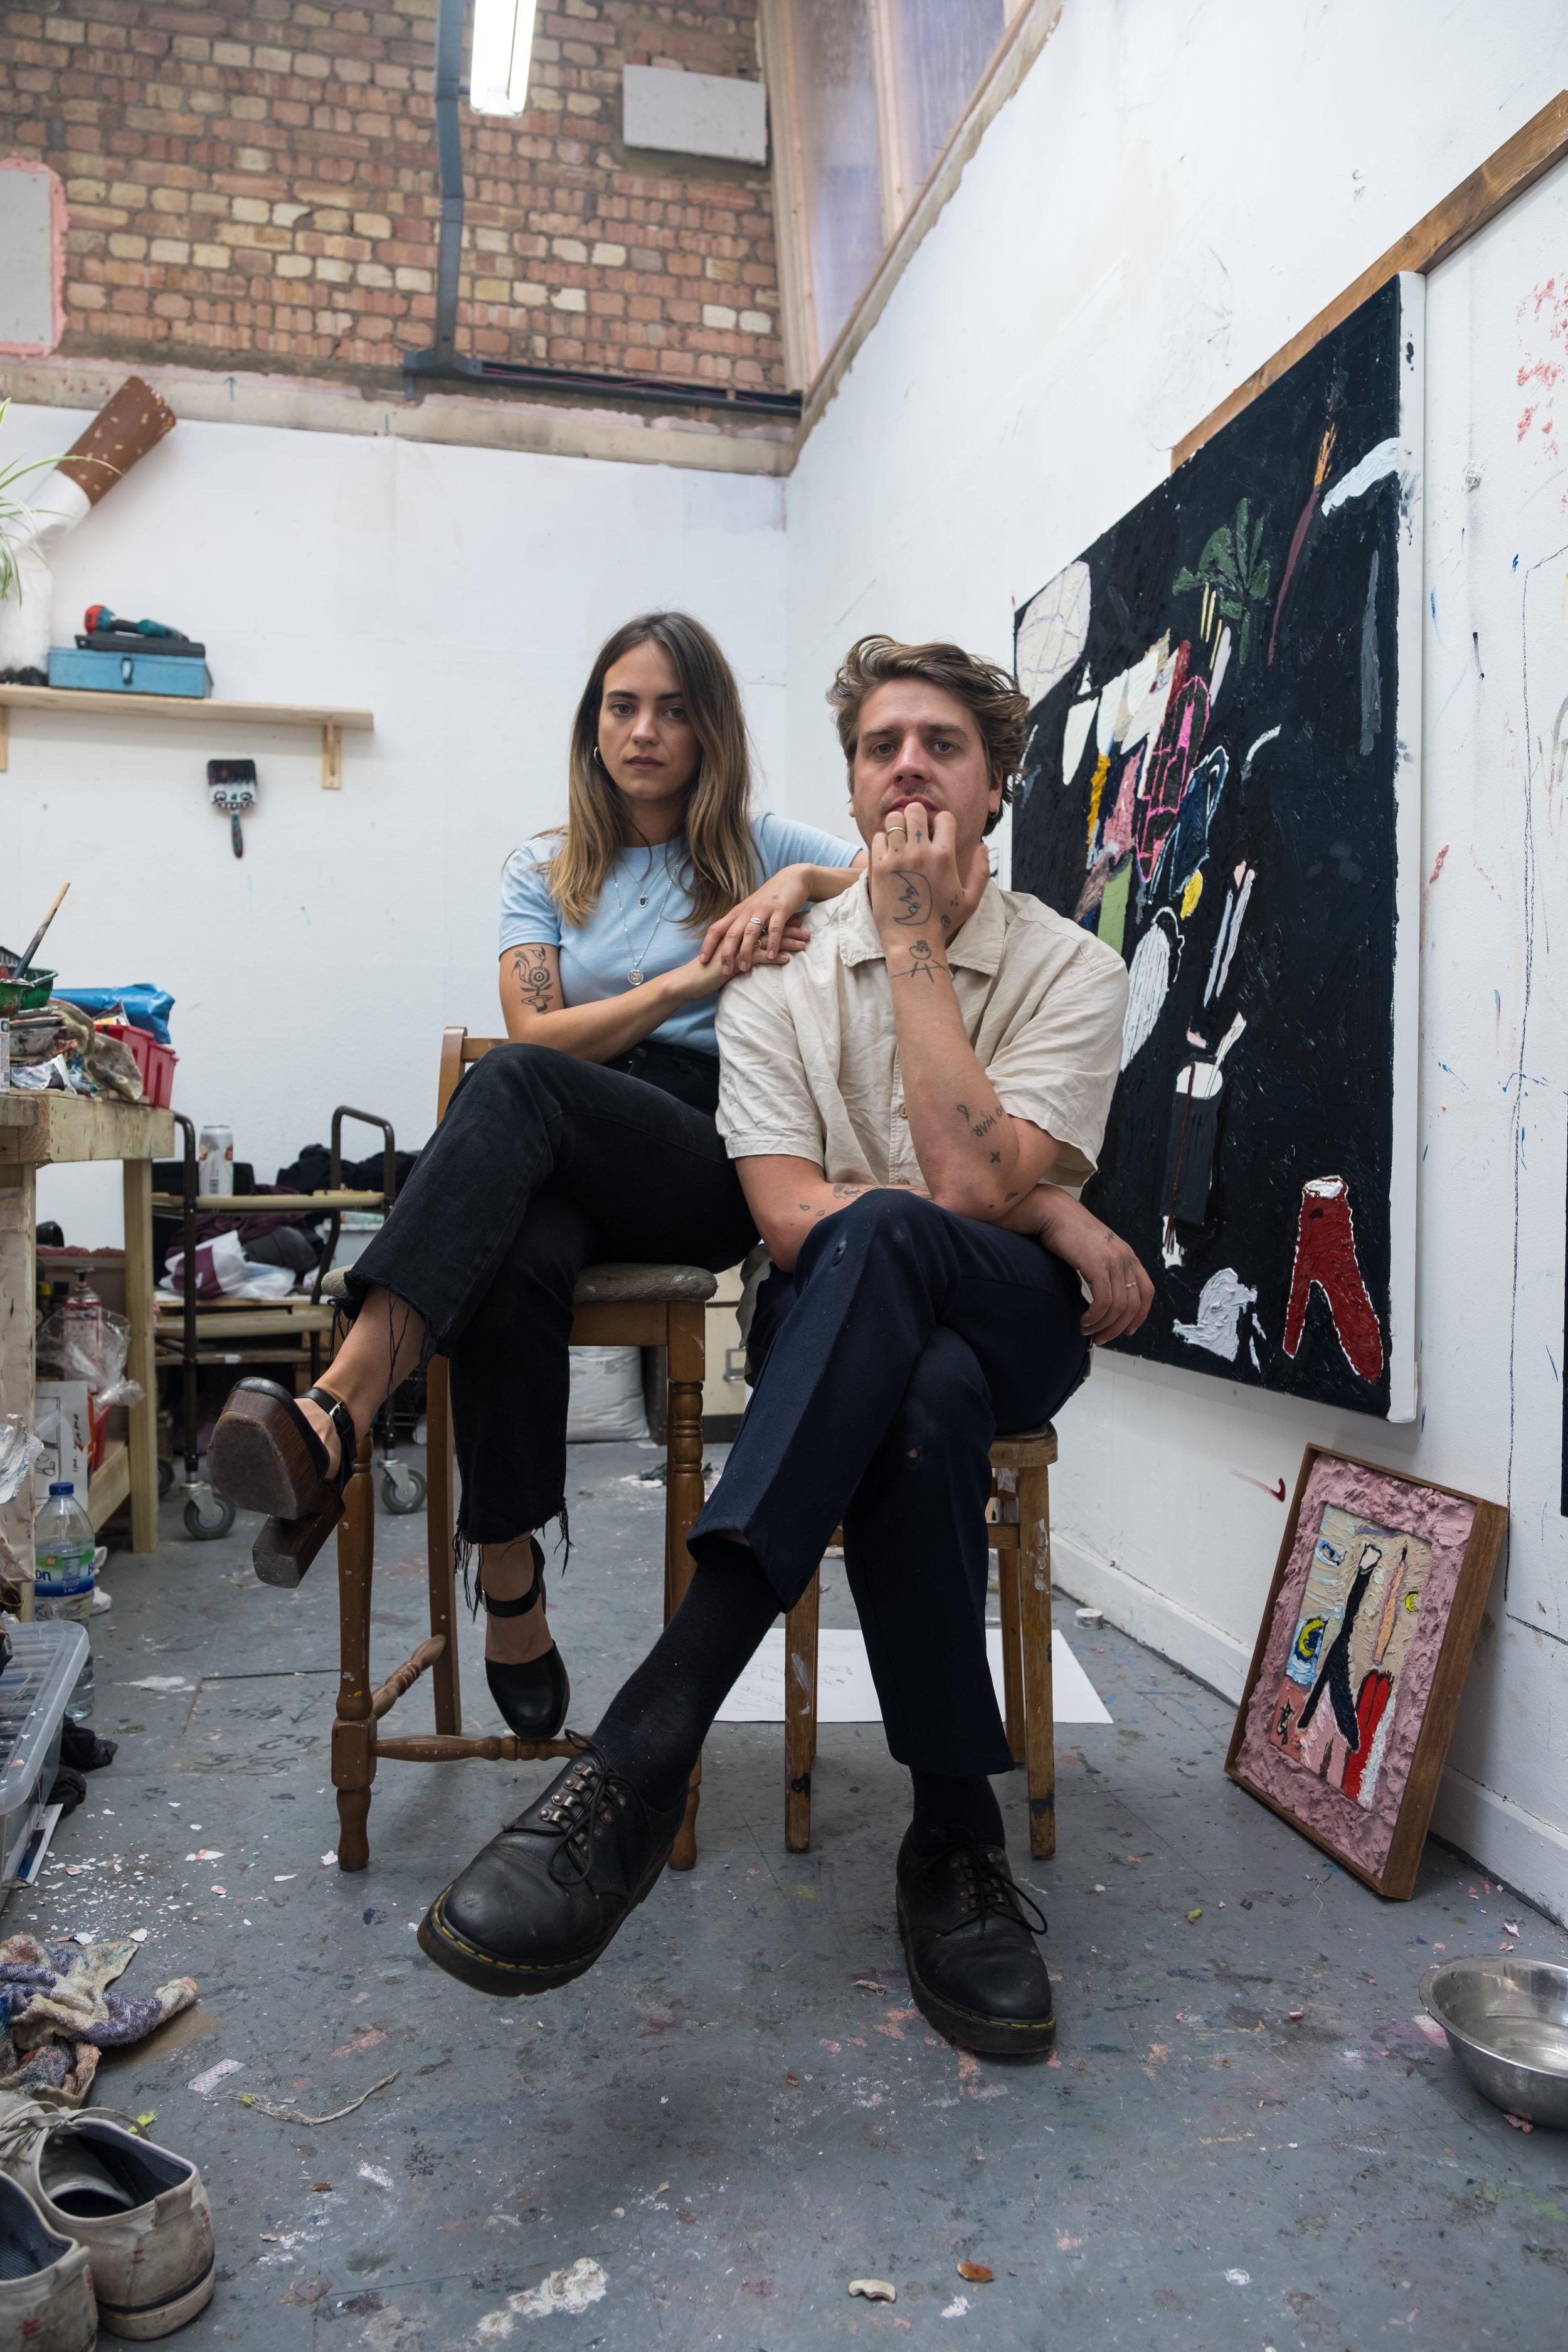 Thom Trojanowski and Stevie Dix in their Suffolk Studio.